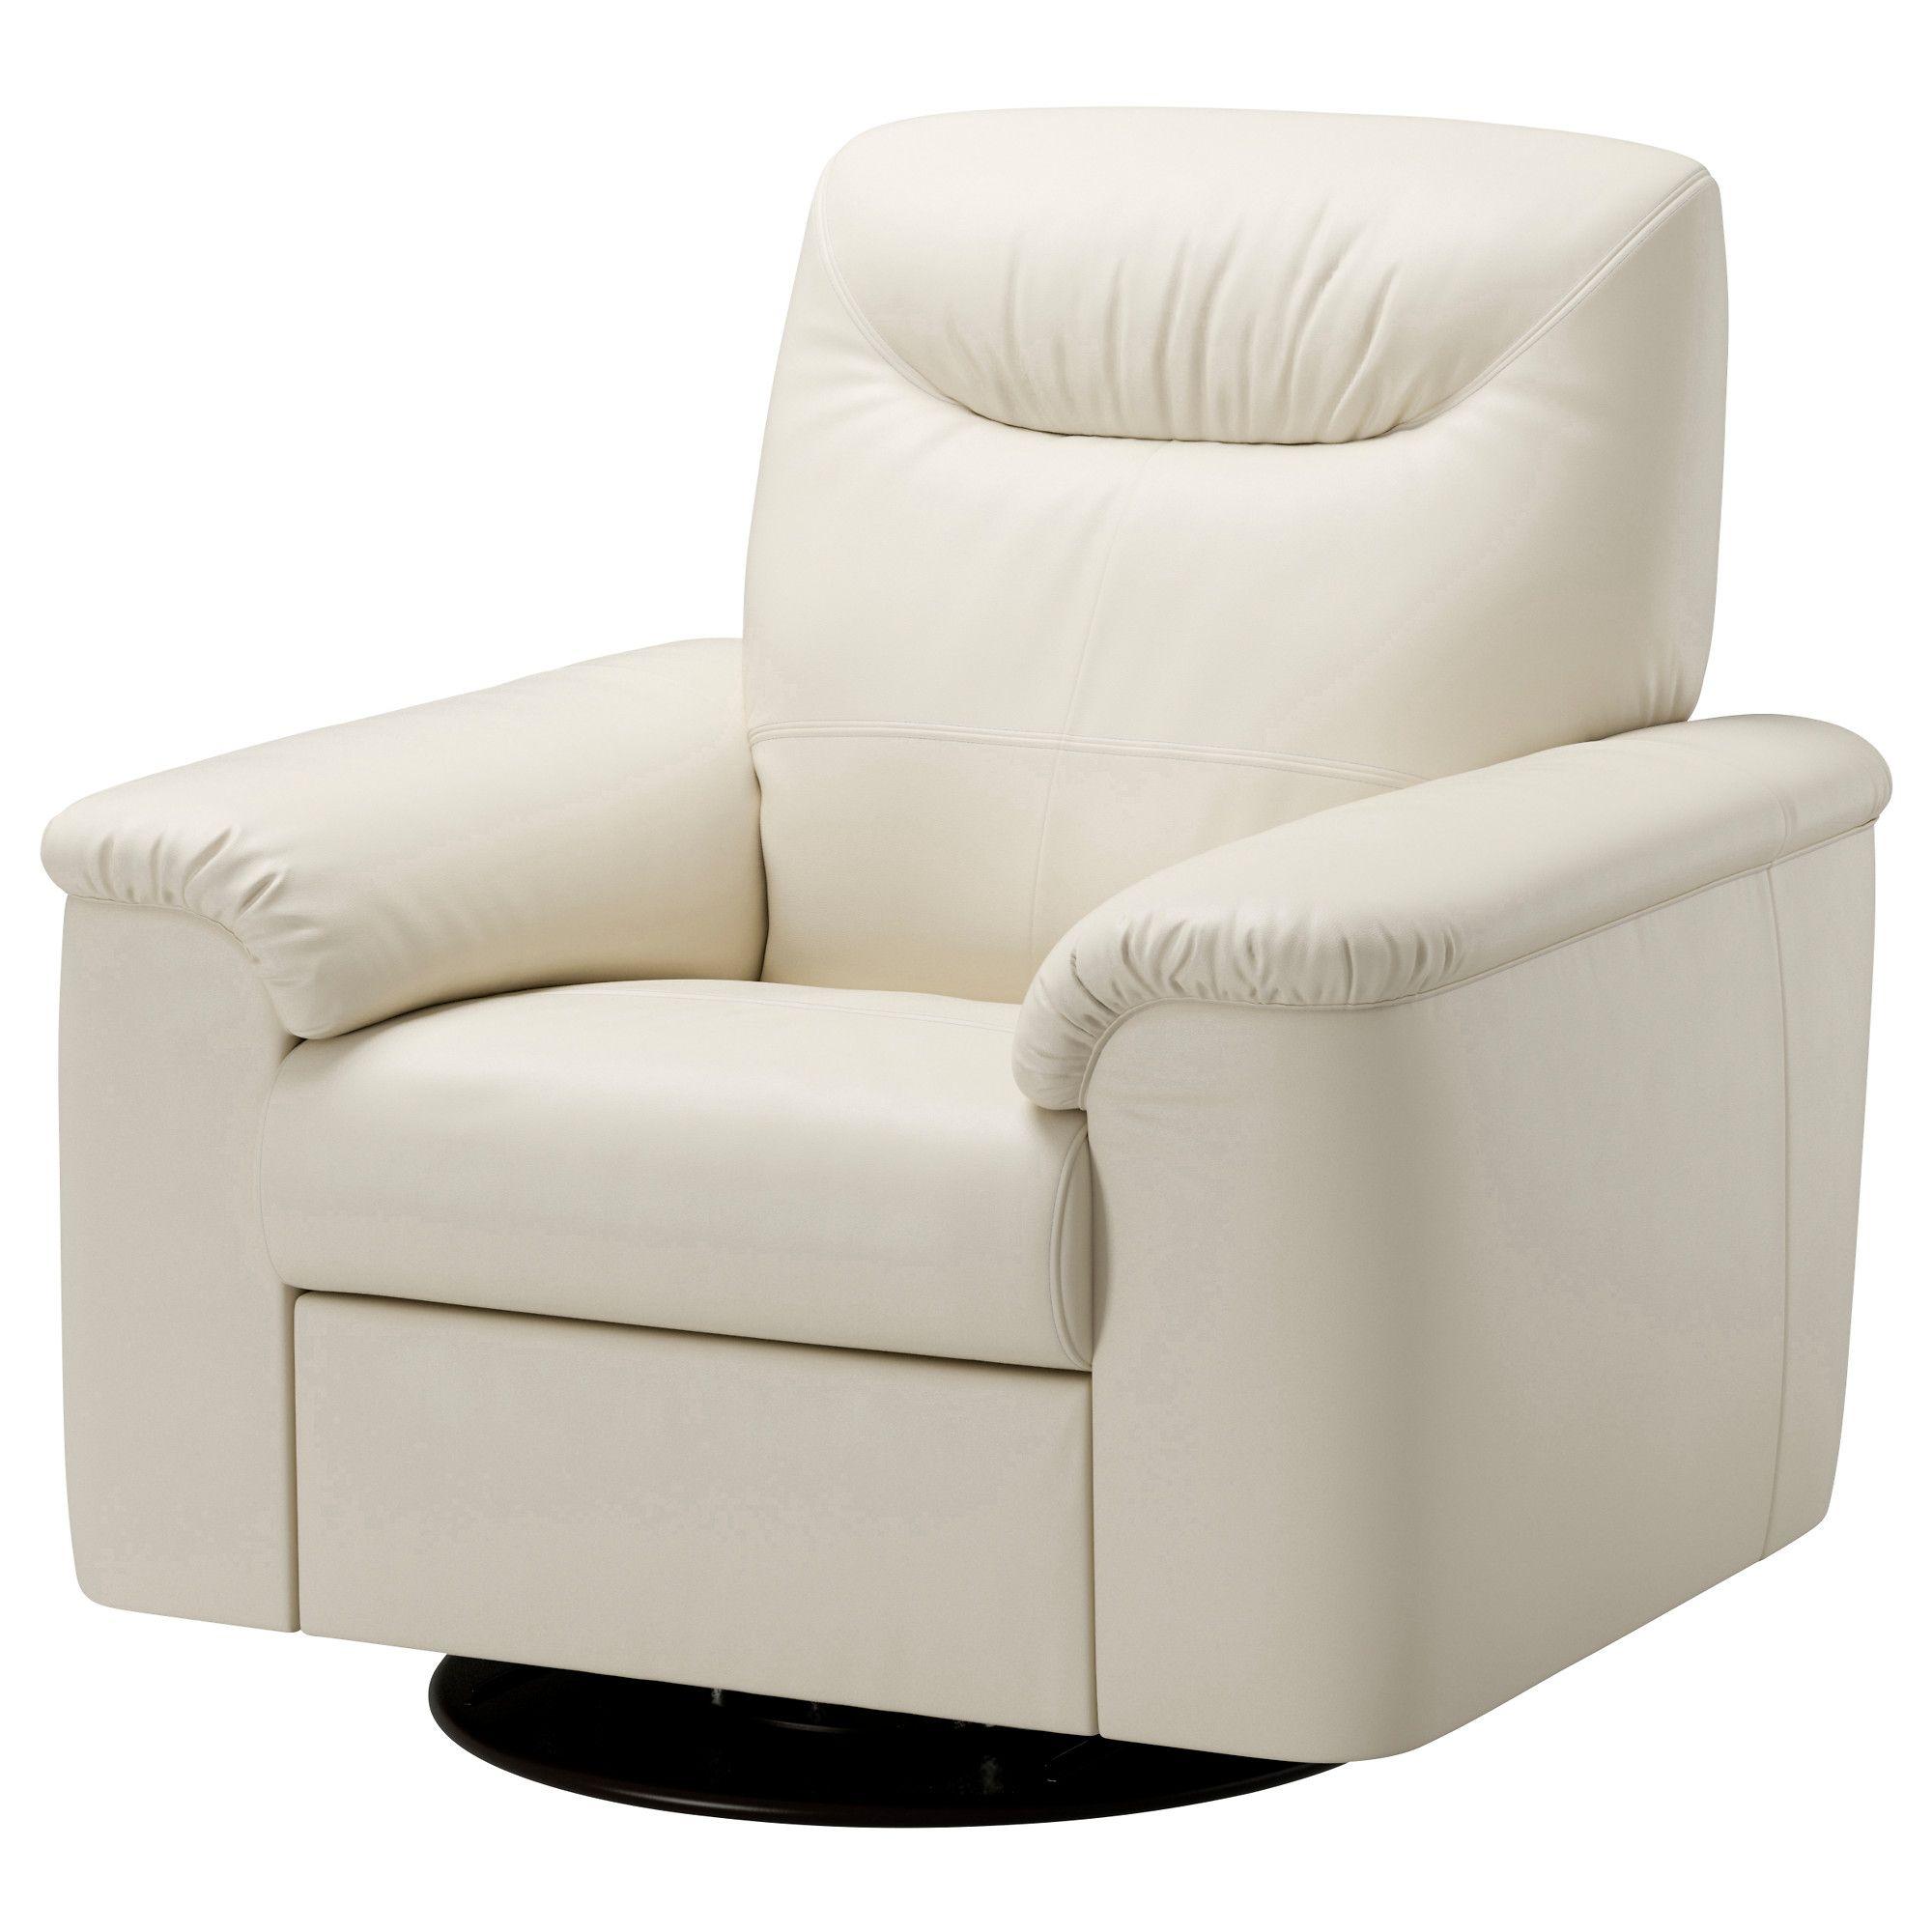 US Furniture and Home Furnishings Home ideas Swivel